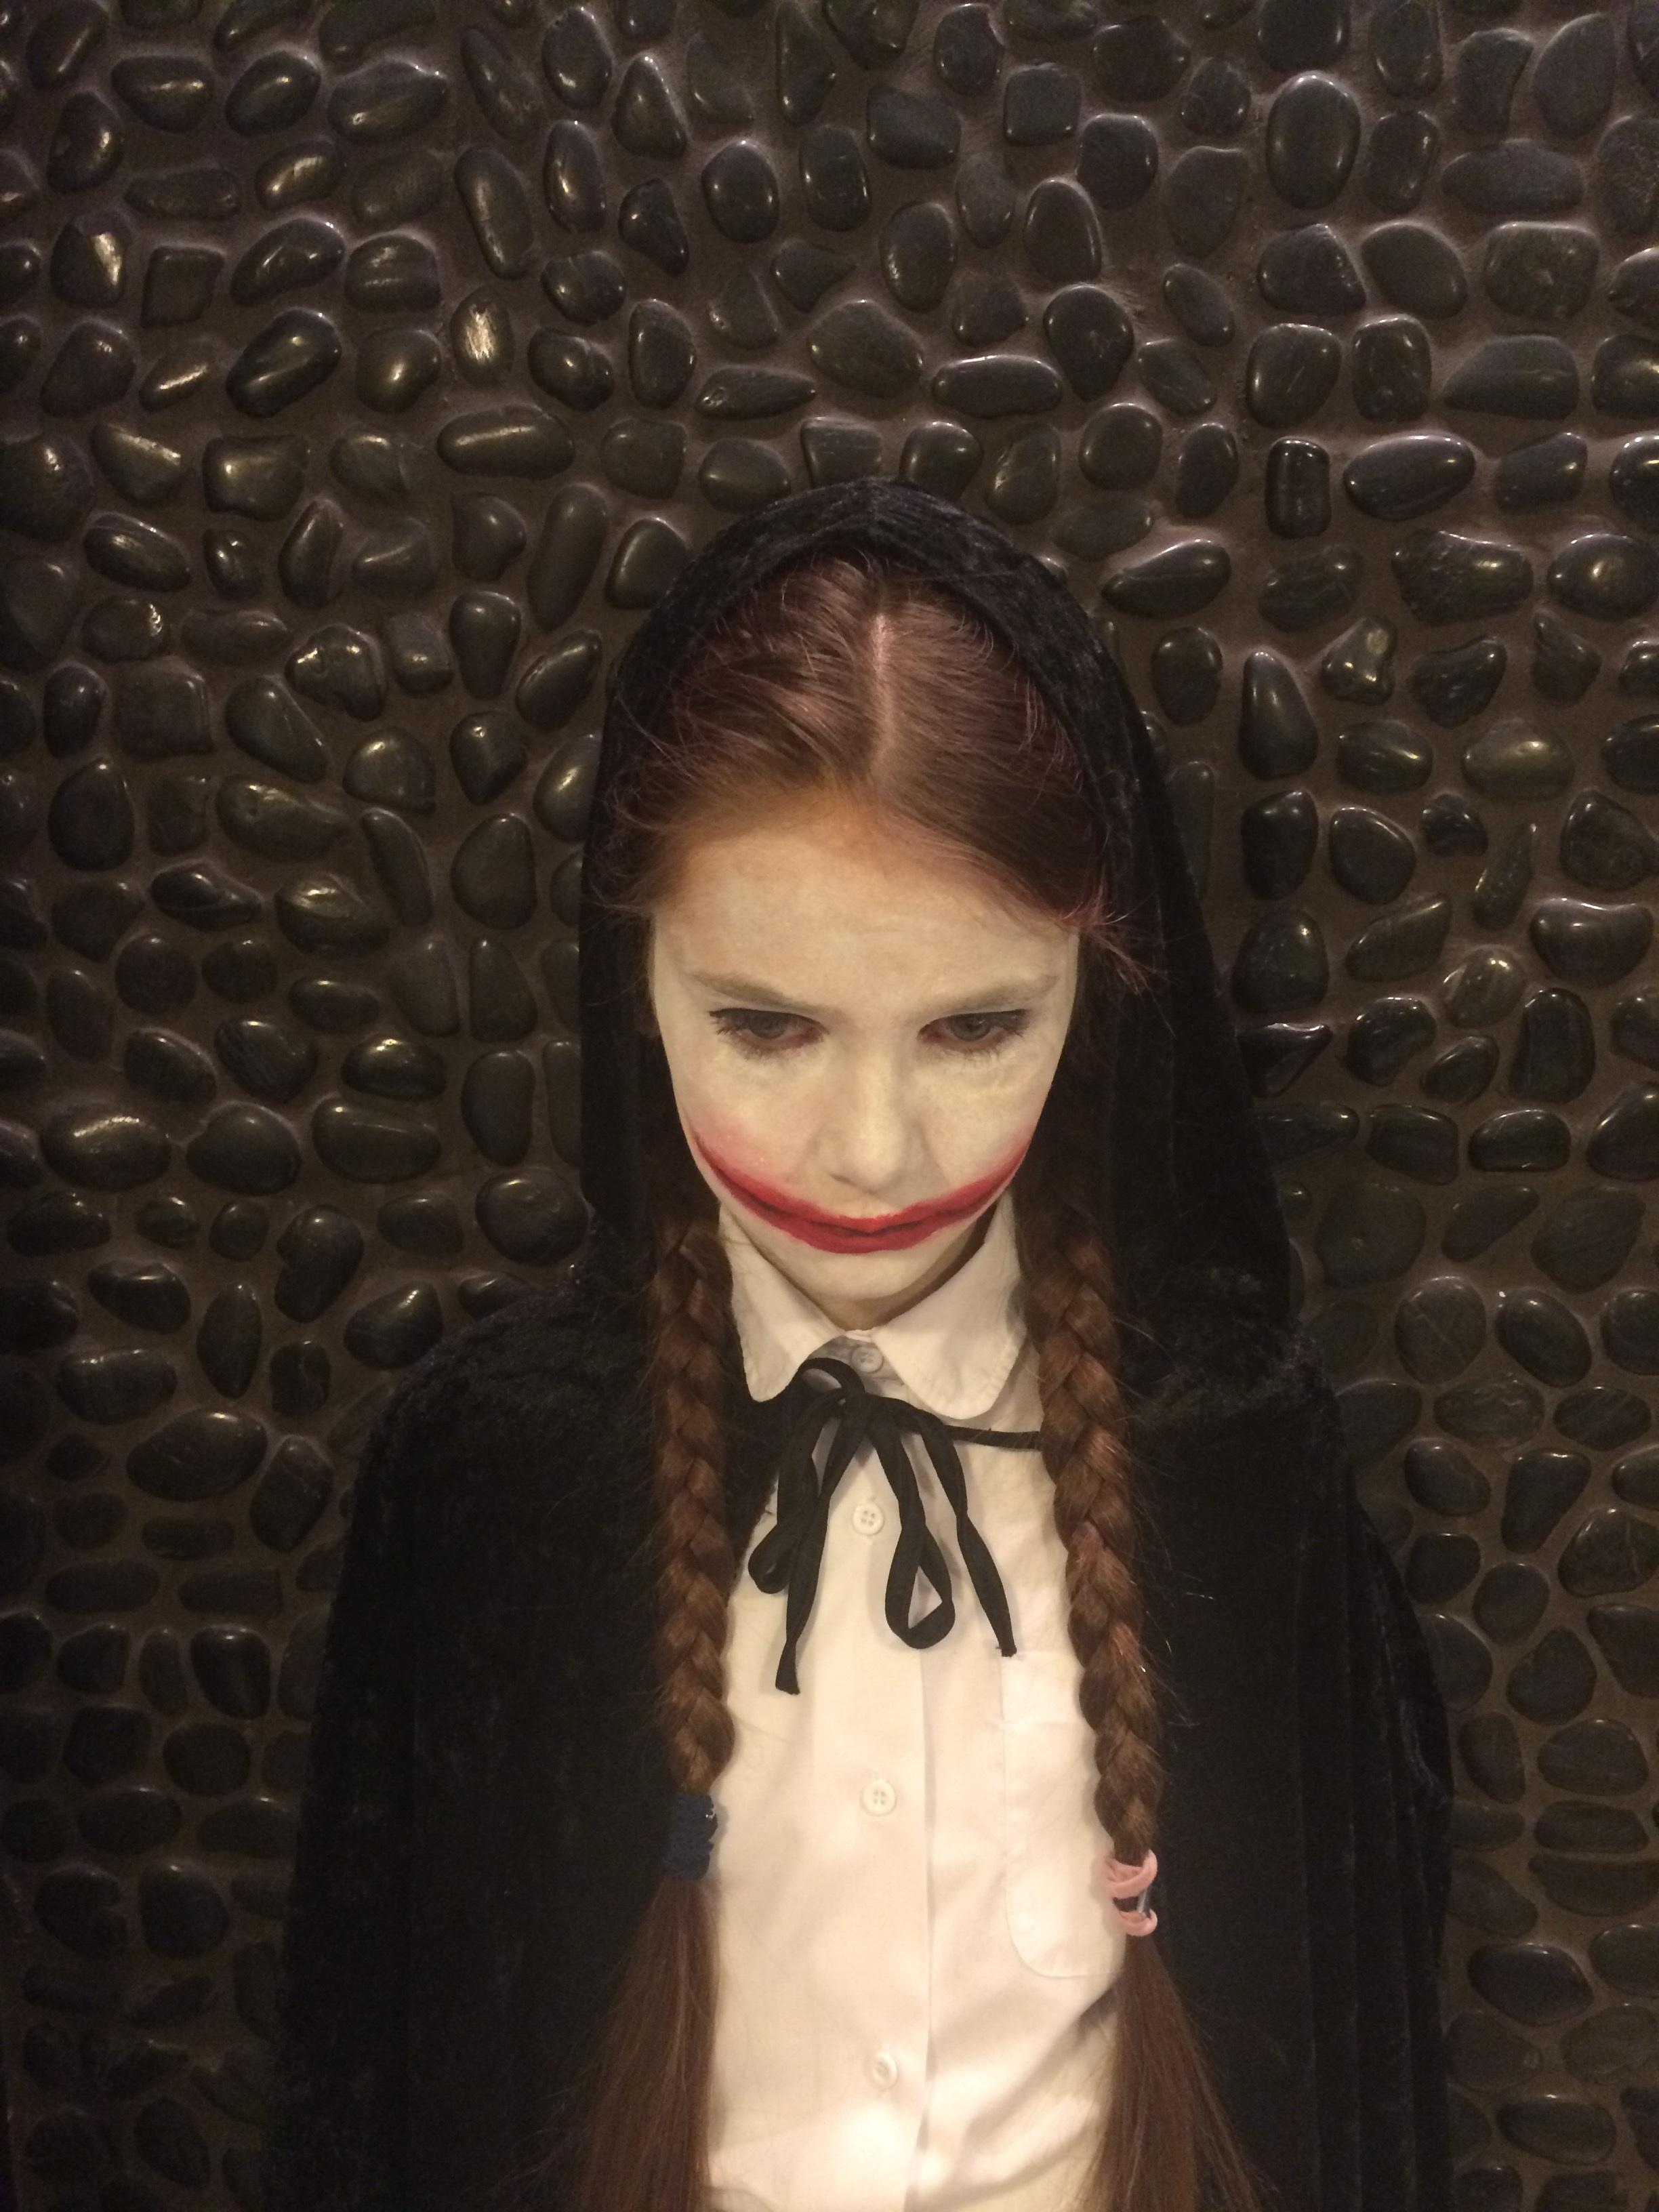 Poze Femeie Par Portret Halloween Copil Negru Doamnă